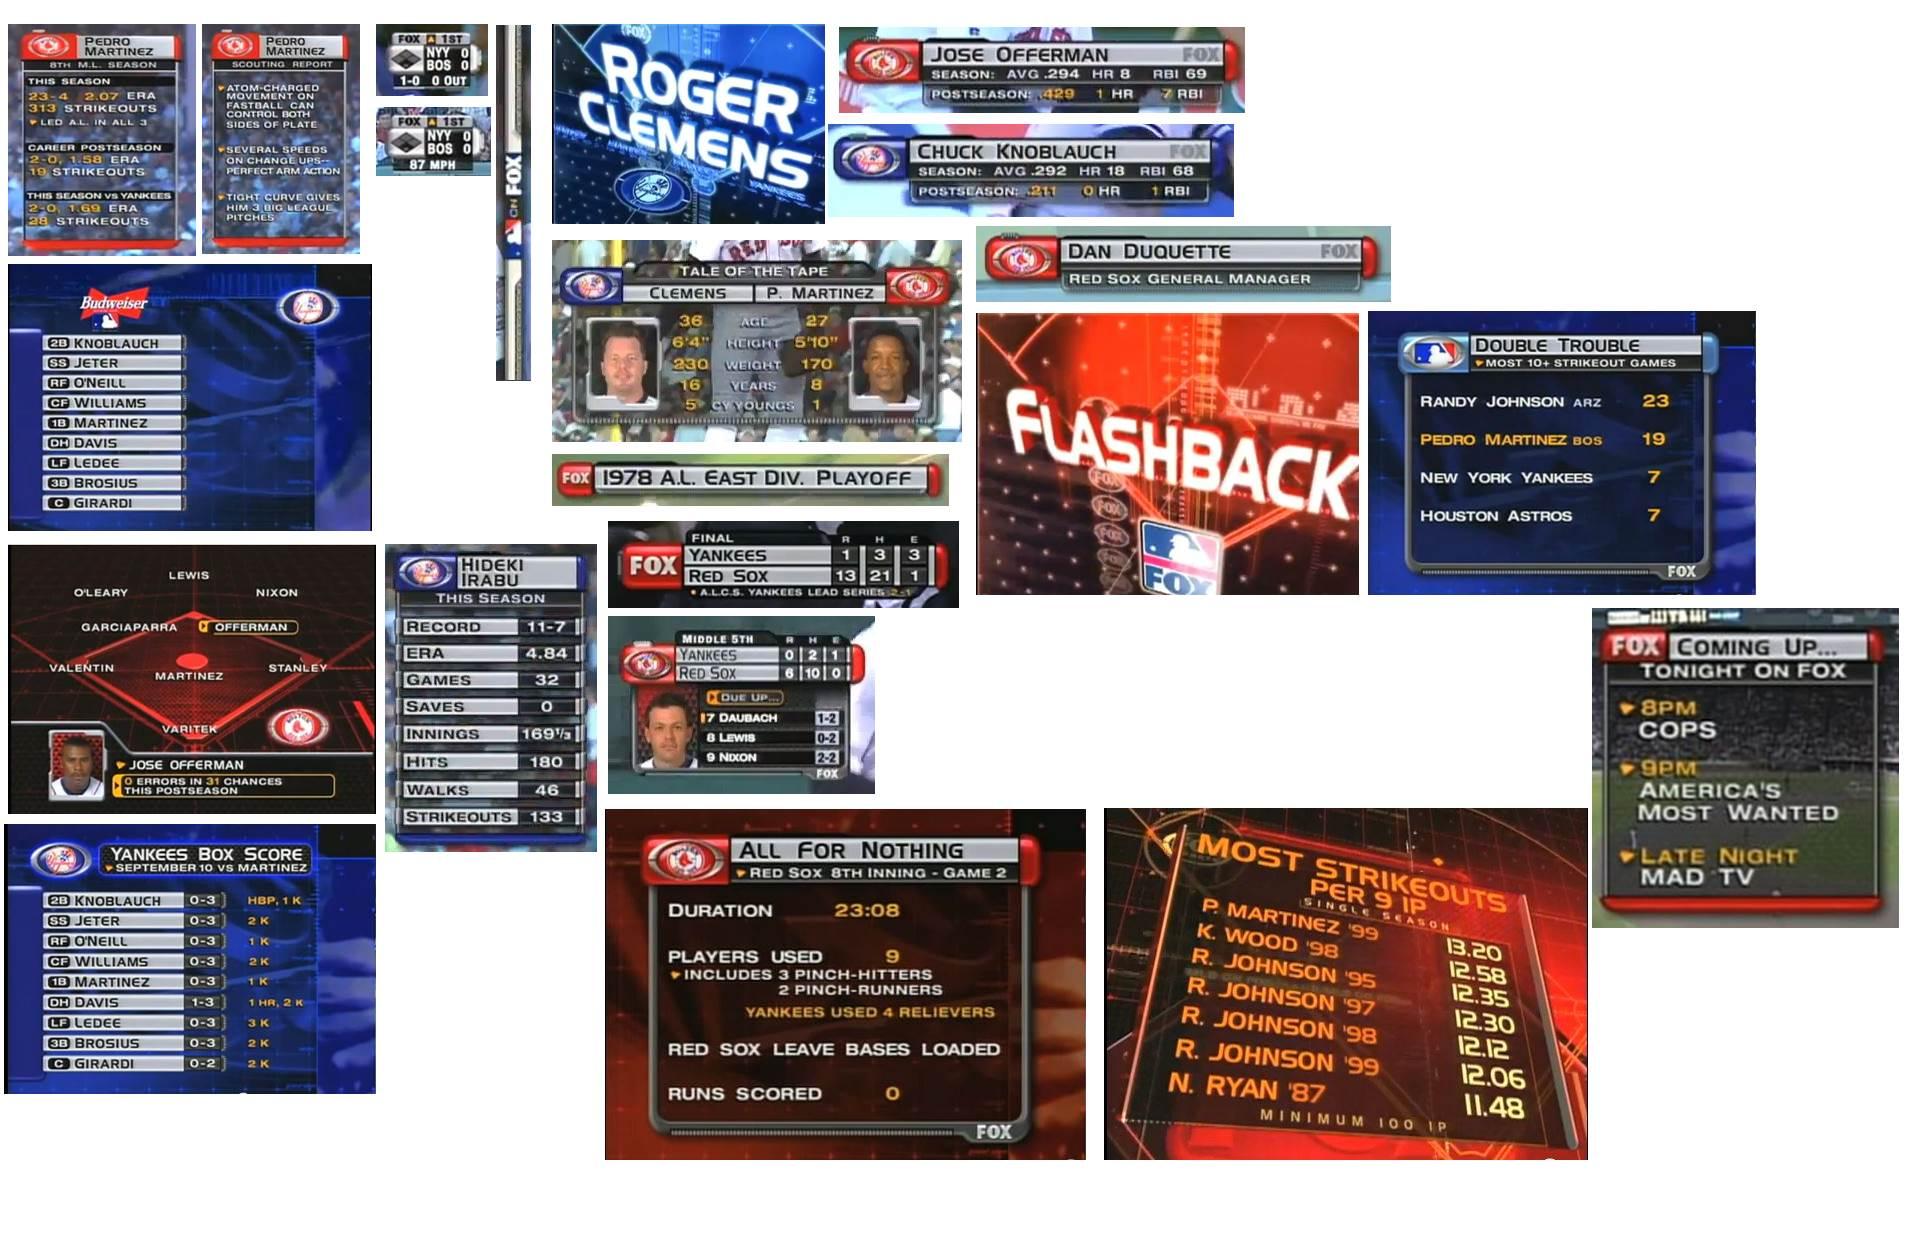 MLB_on_FOX_1999-2000_%281%29.jpg